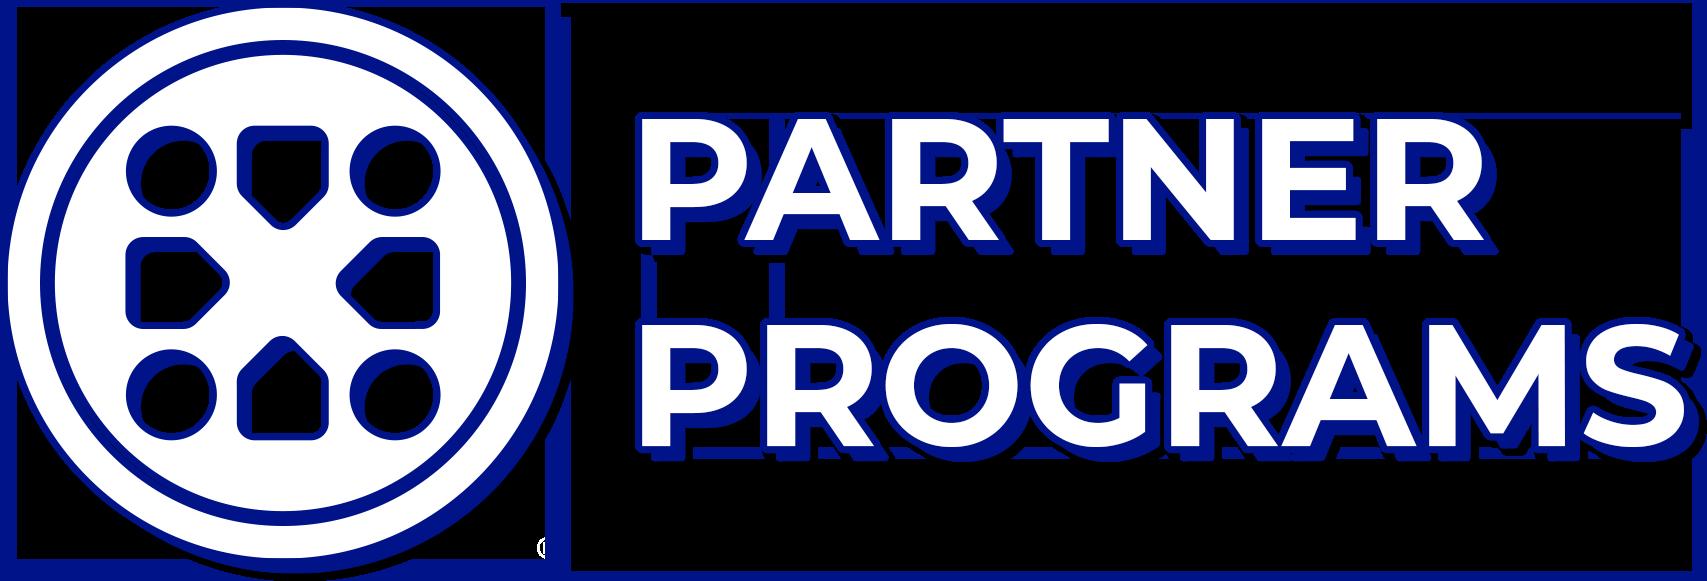 partner-programs-banner-logo.png